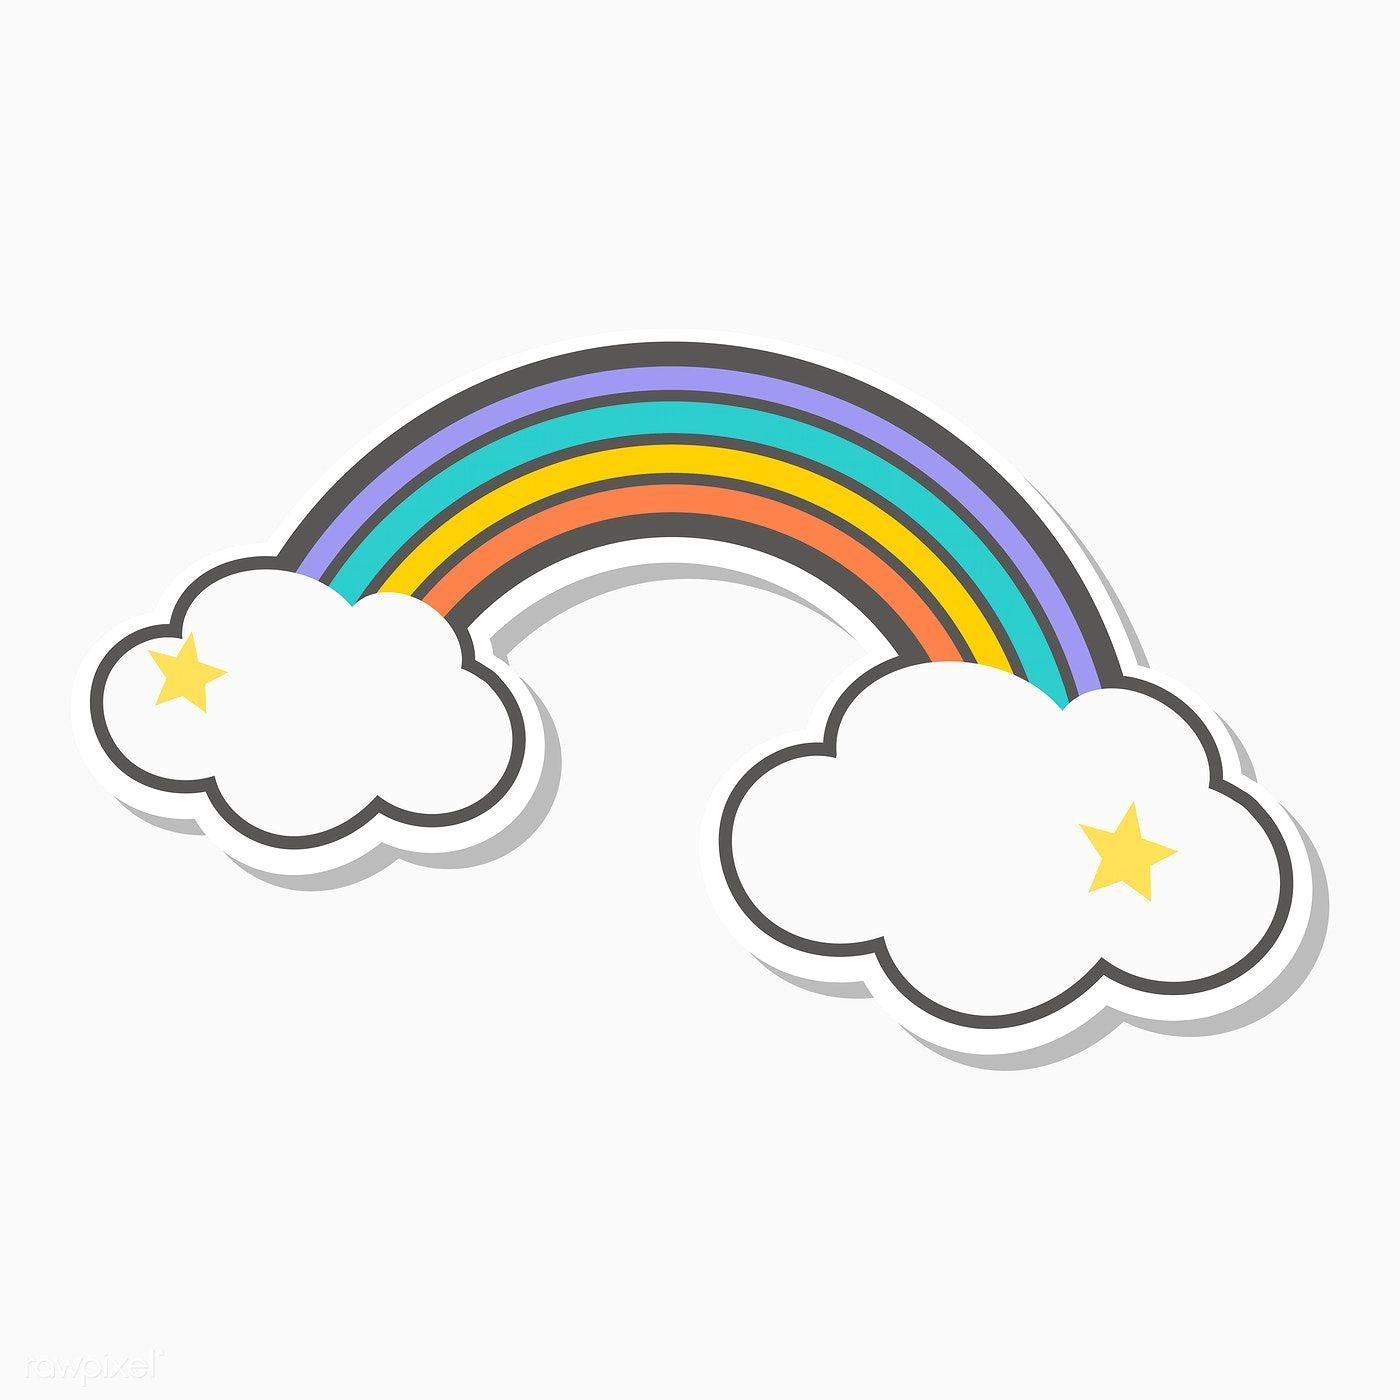 Magical Rainbow Unicorn Illustration Vector Free Image By Rawpixel Com Unicorn Illustration Rainbow Cartoon Cloud Stickers